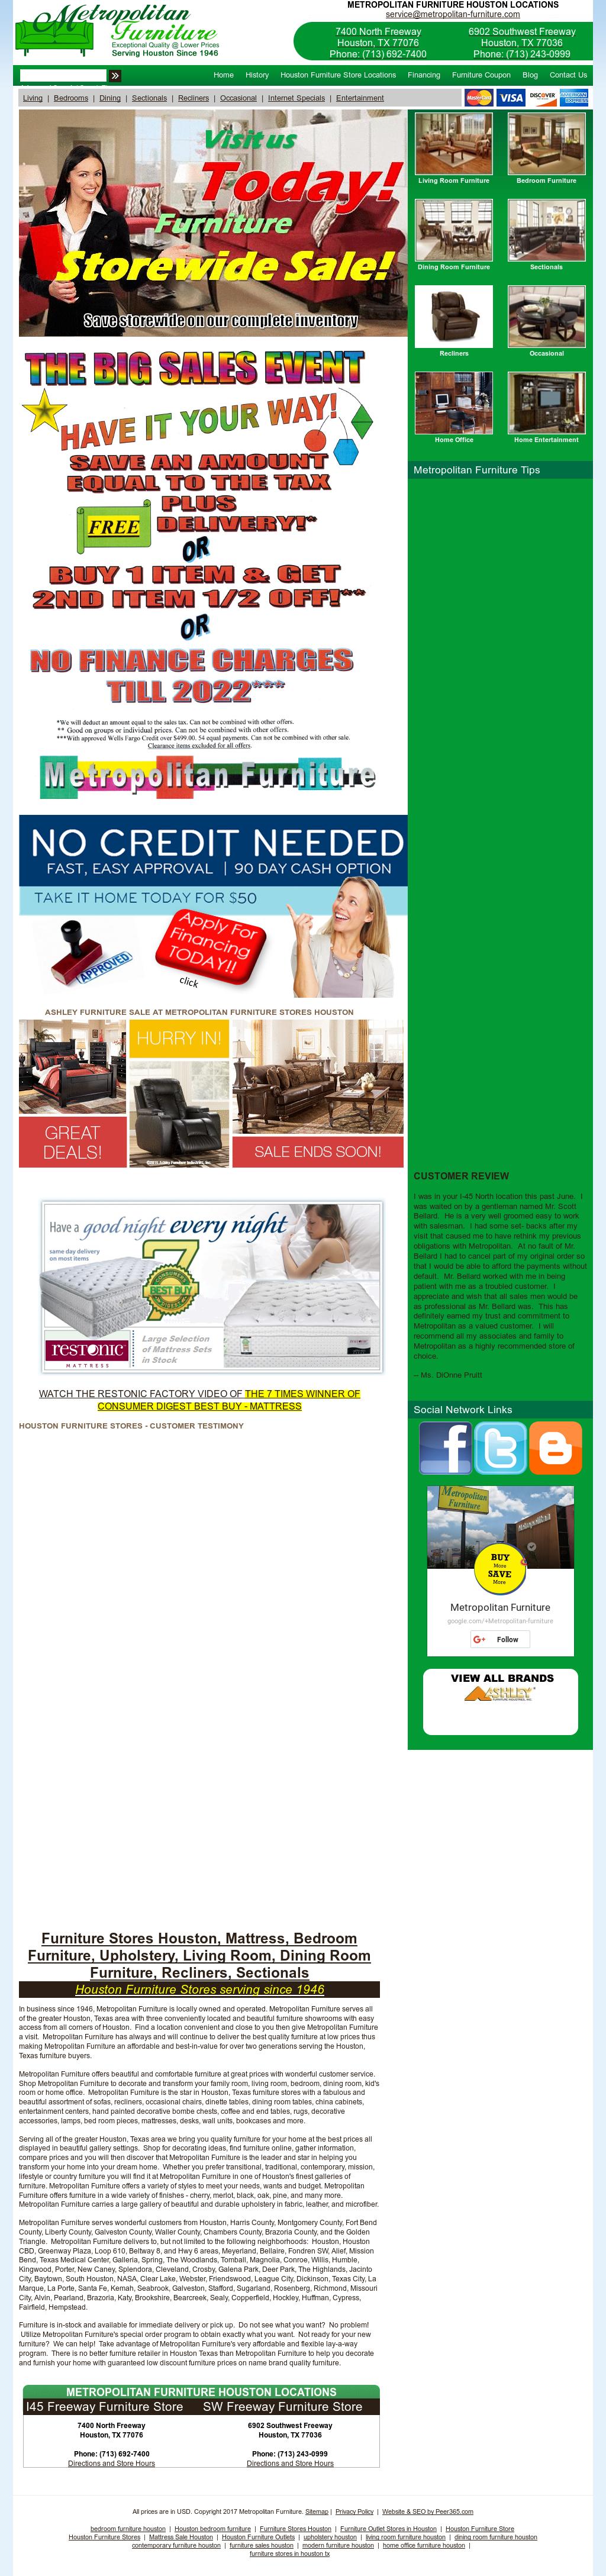 Attirant Metropolitan Furniture Website History